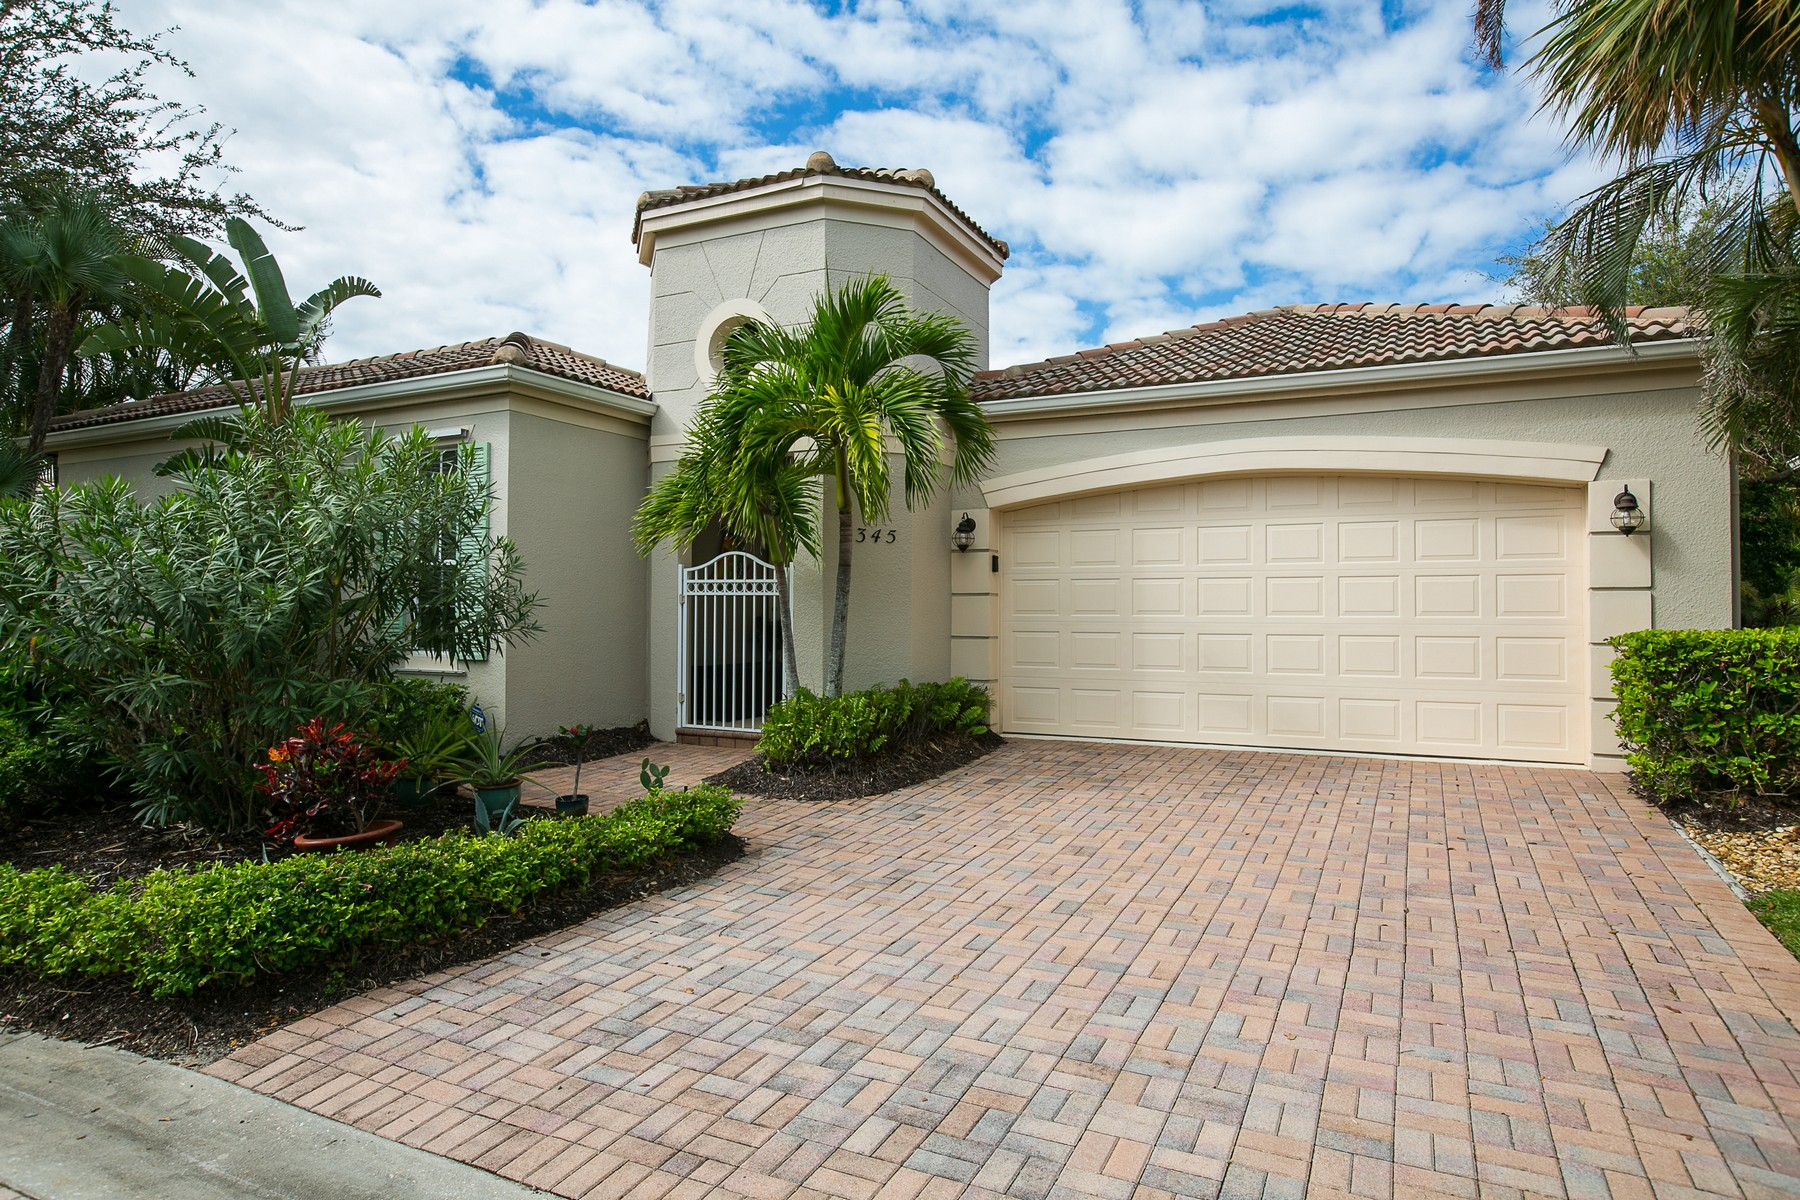 独户住宅 为 销售 在 Stunning Home in Old Orchid 9345 W Maiden Court, 维罗海滩, 佛罗里达州, 32963 美国